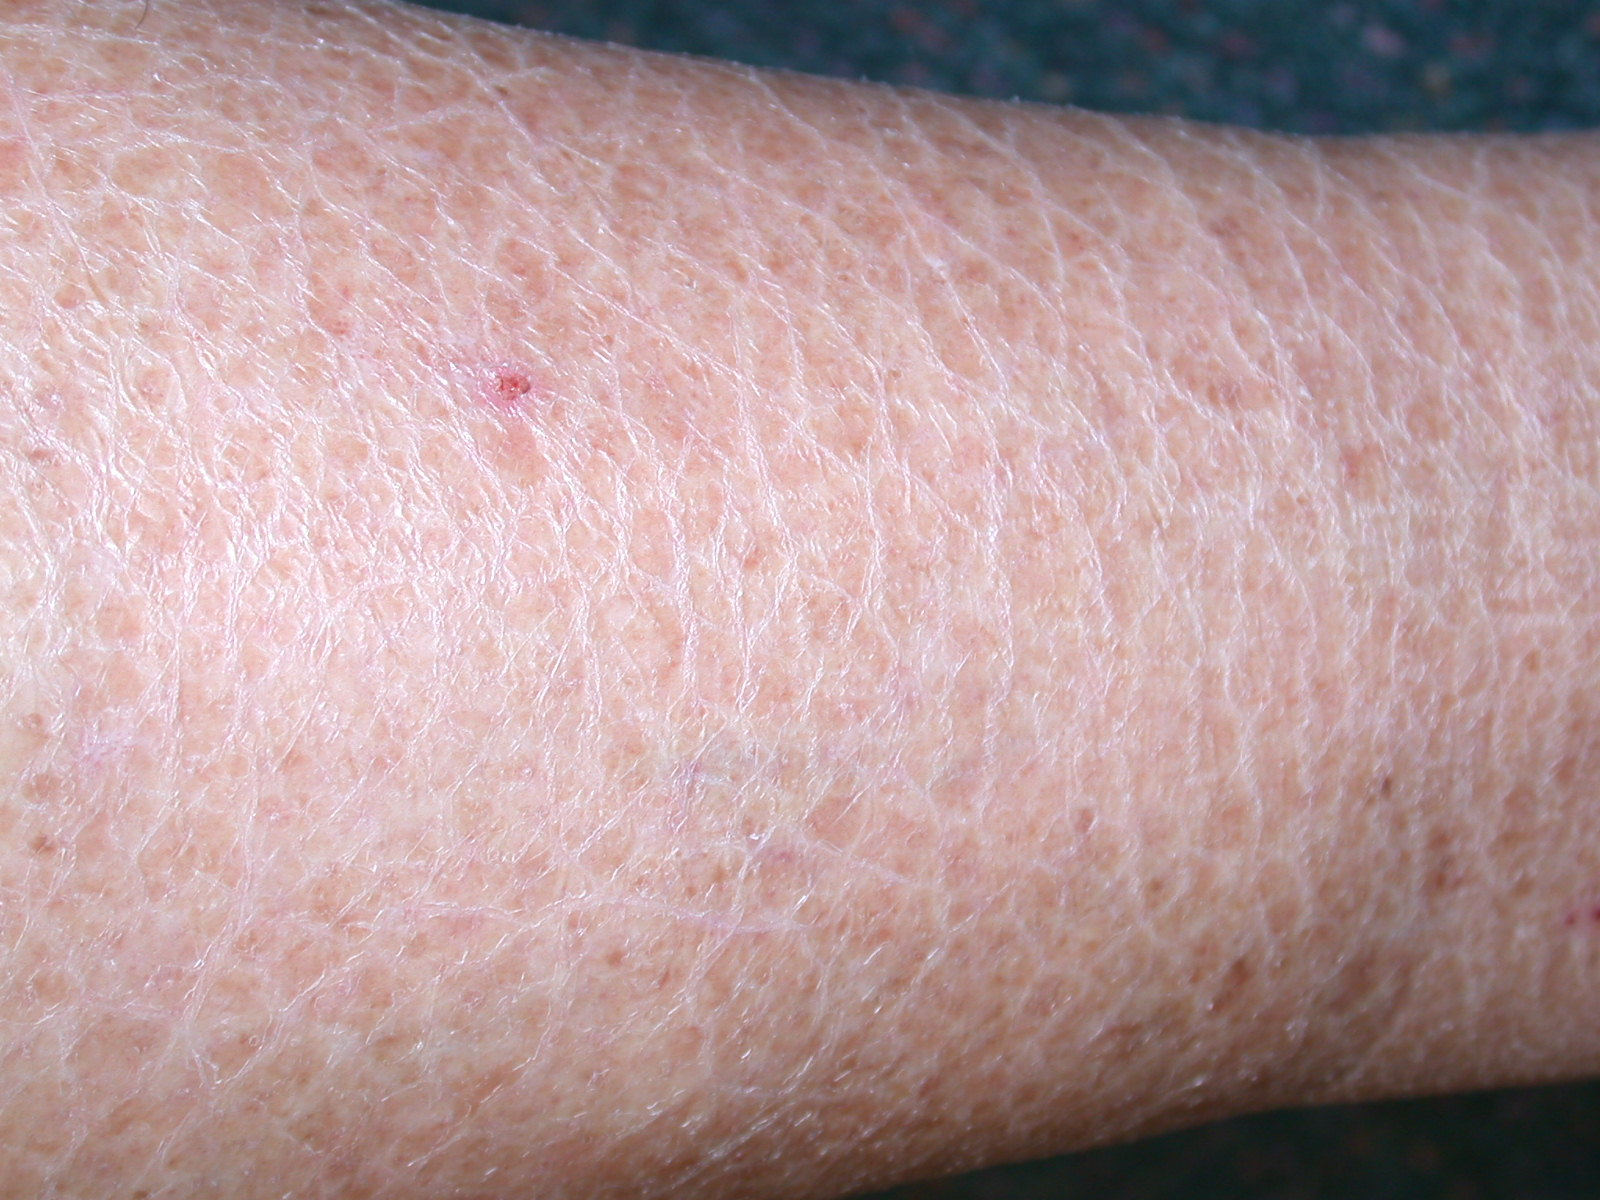 Image gallery ichthyosis vulgaris for Fish scale disease